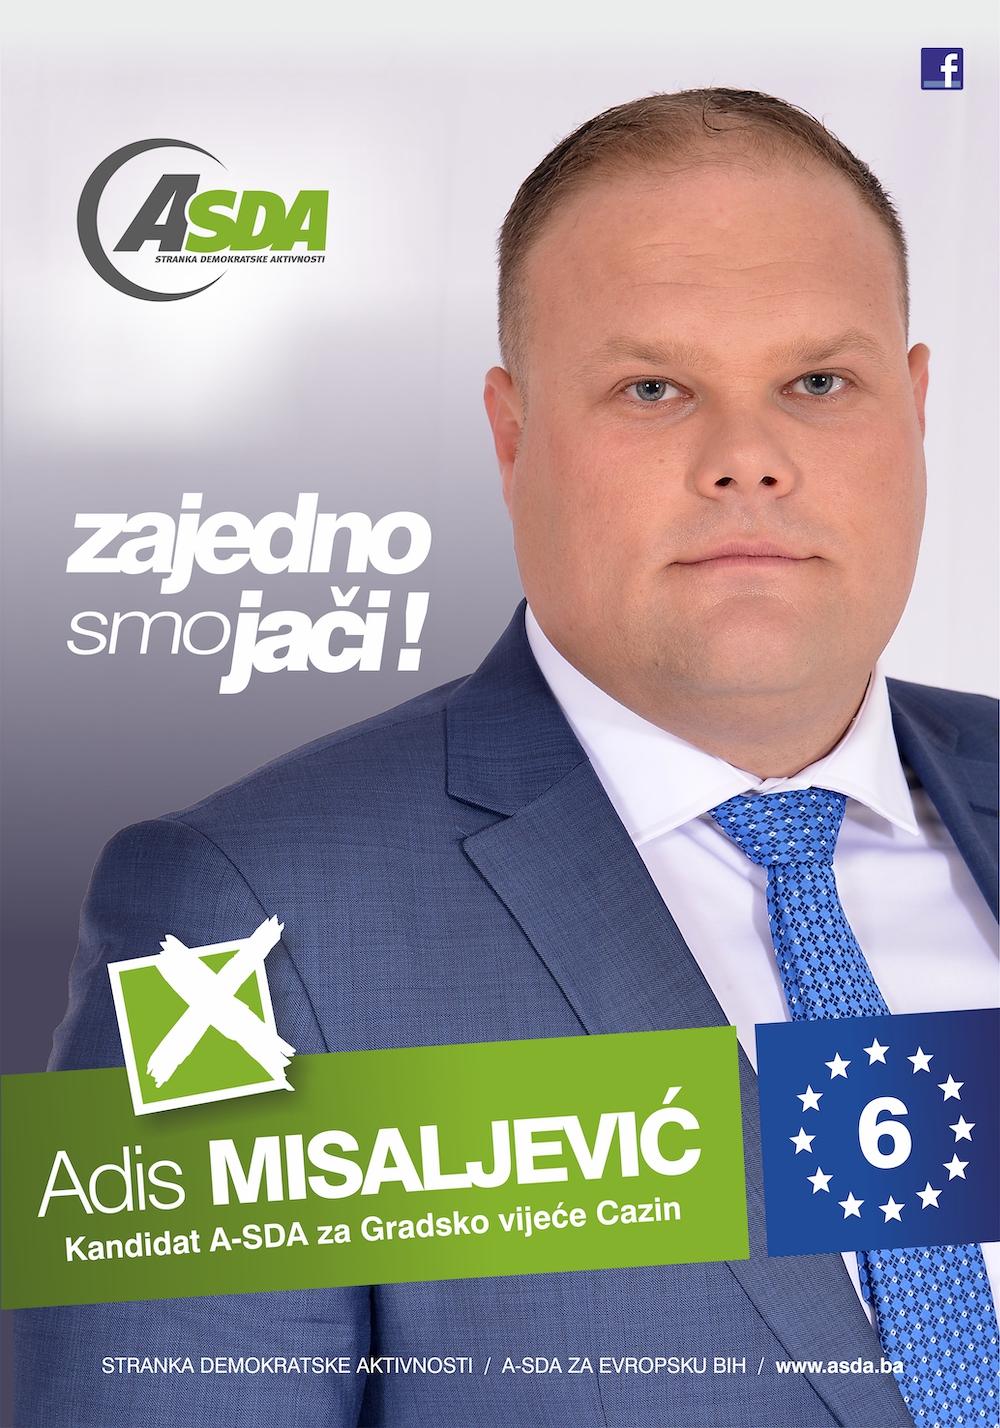 Adis Misaljević